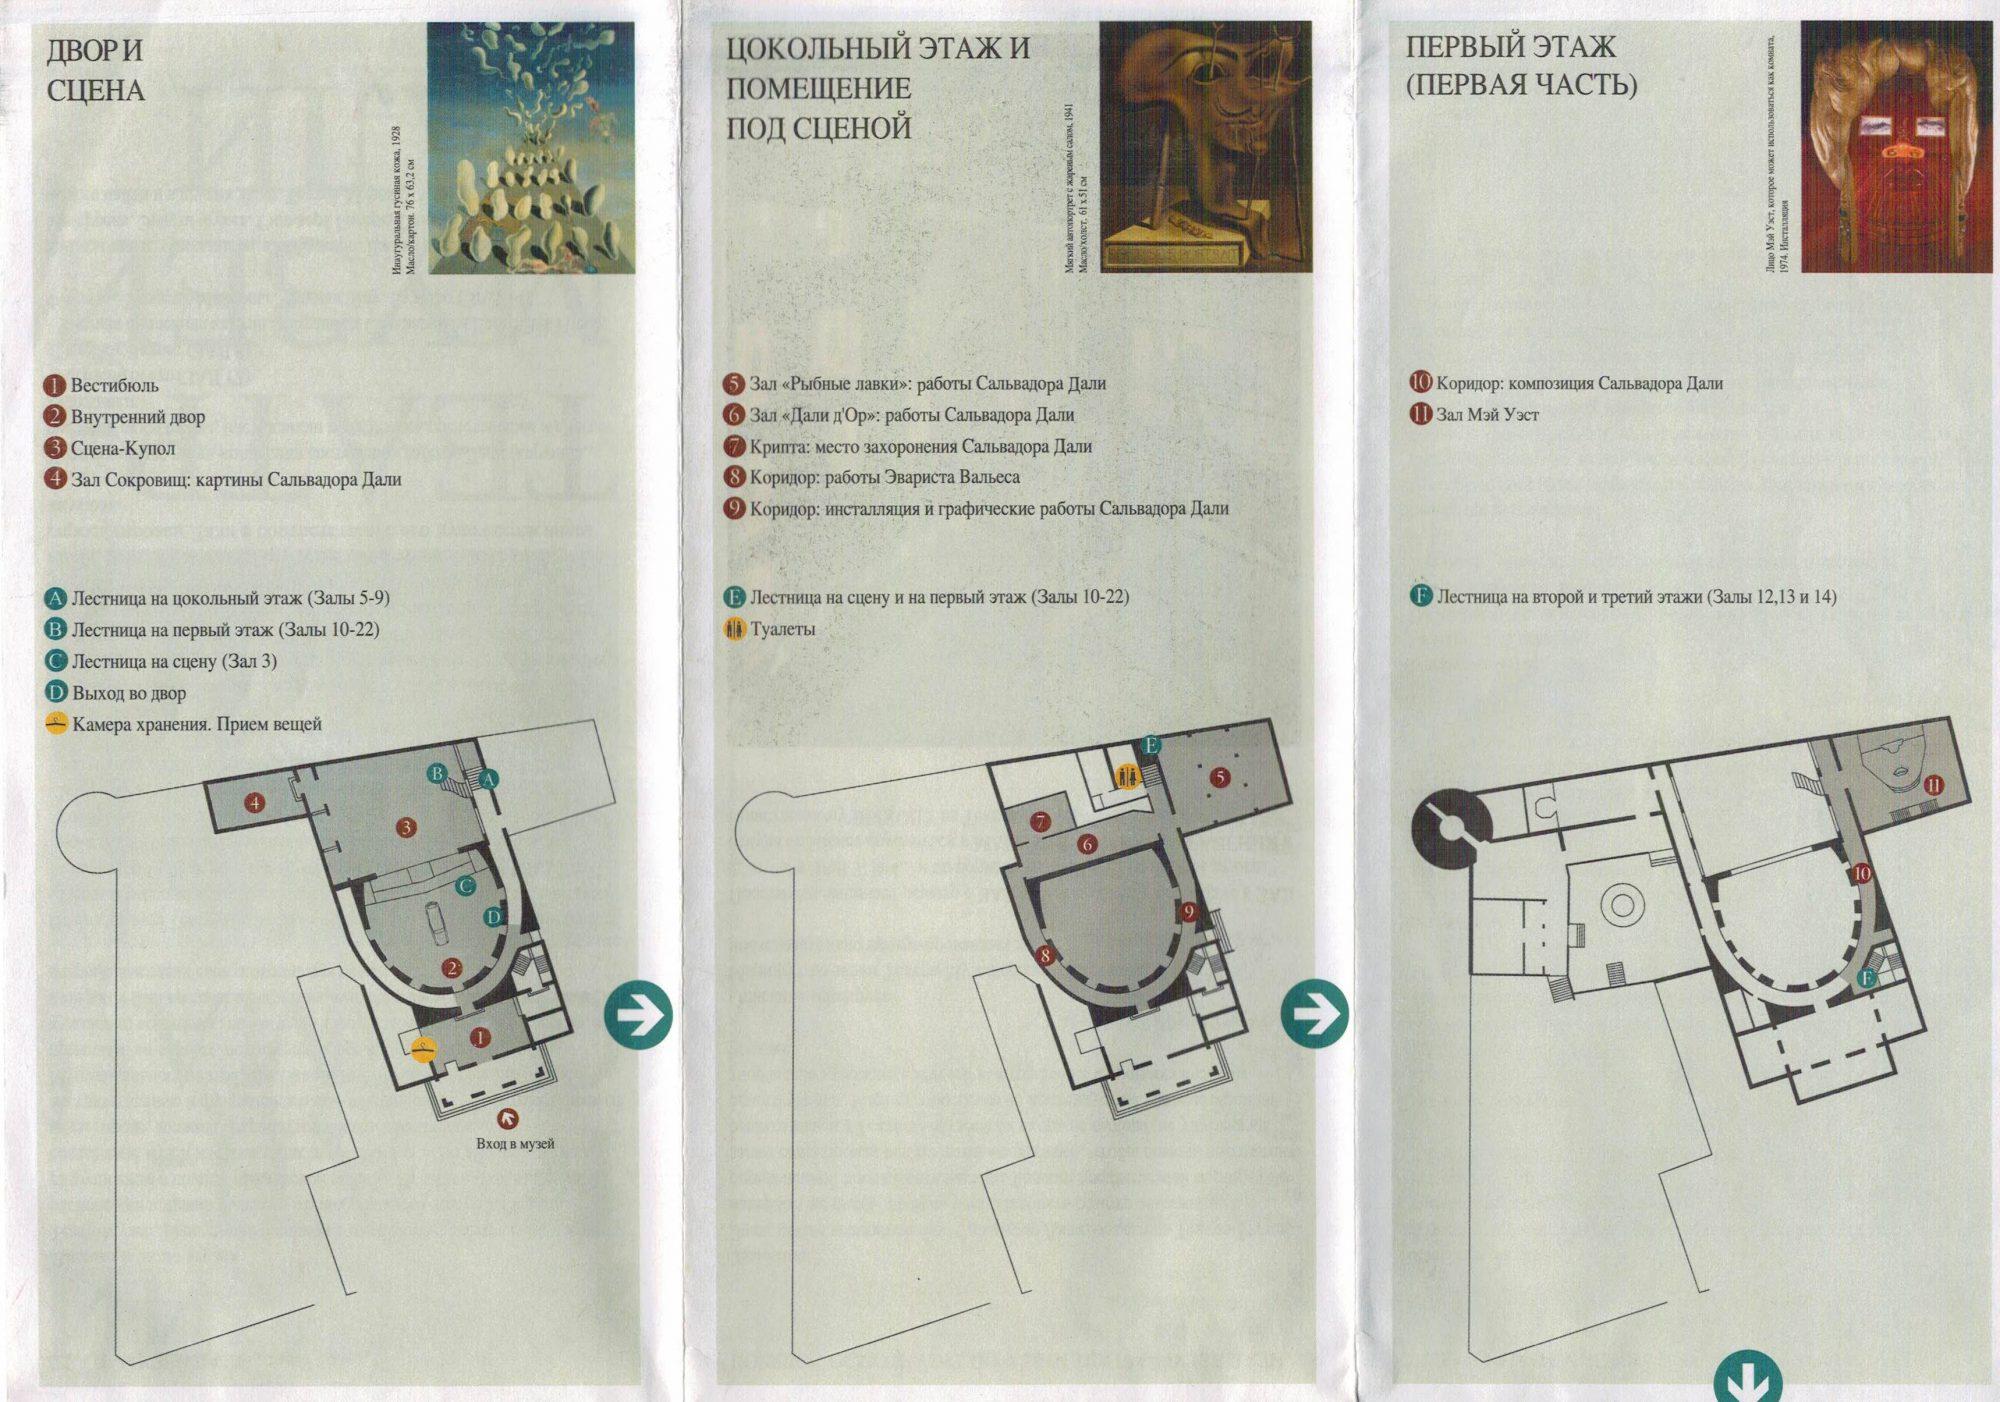 Театр-музей Дали карта